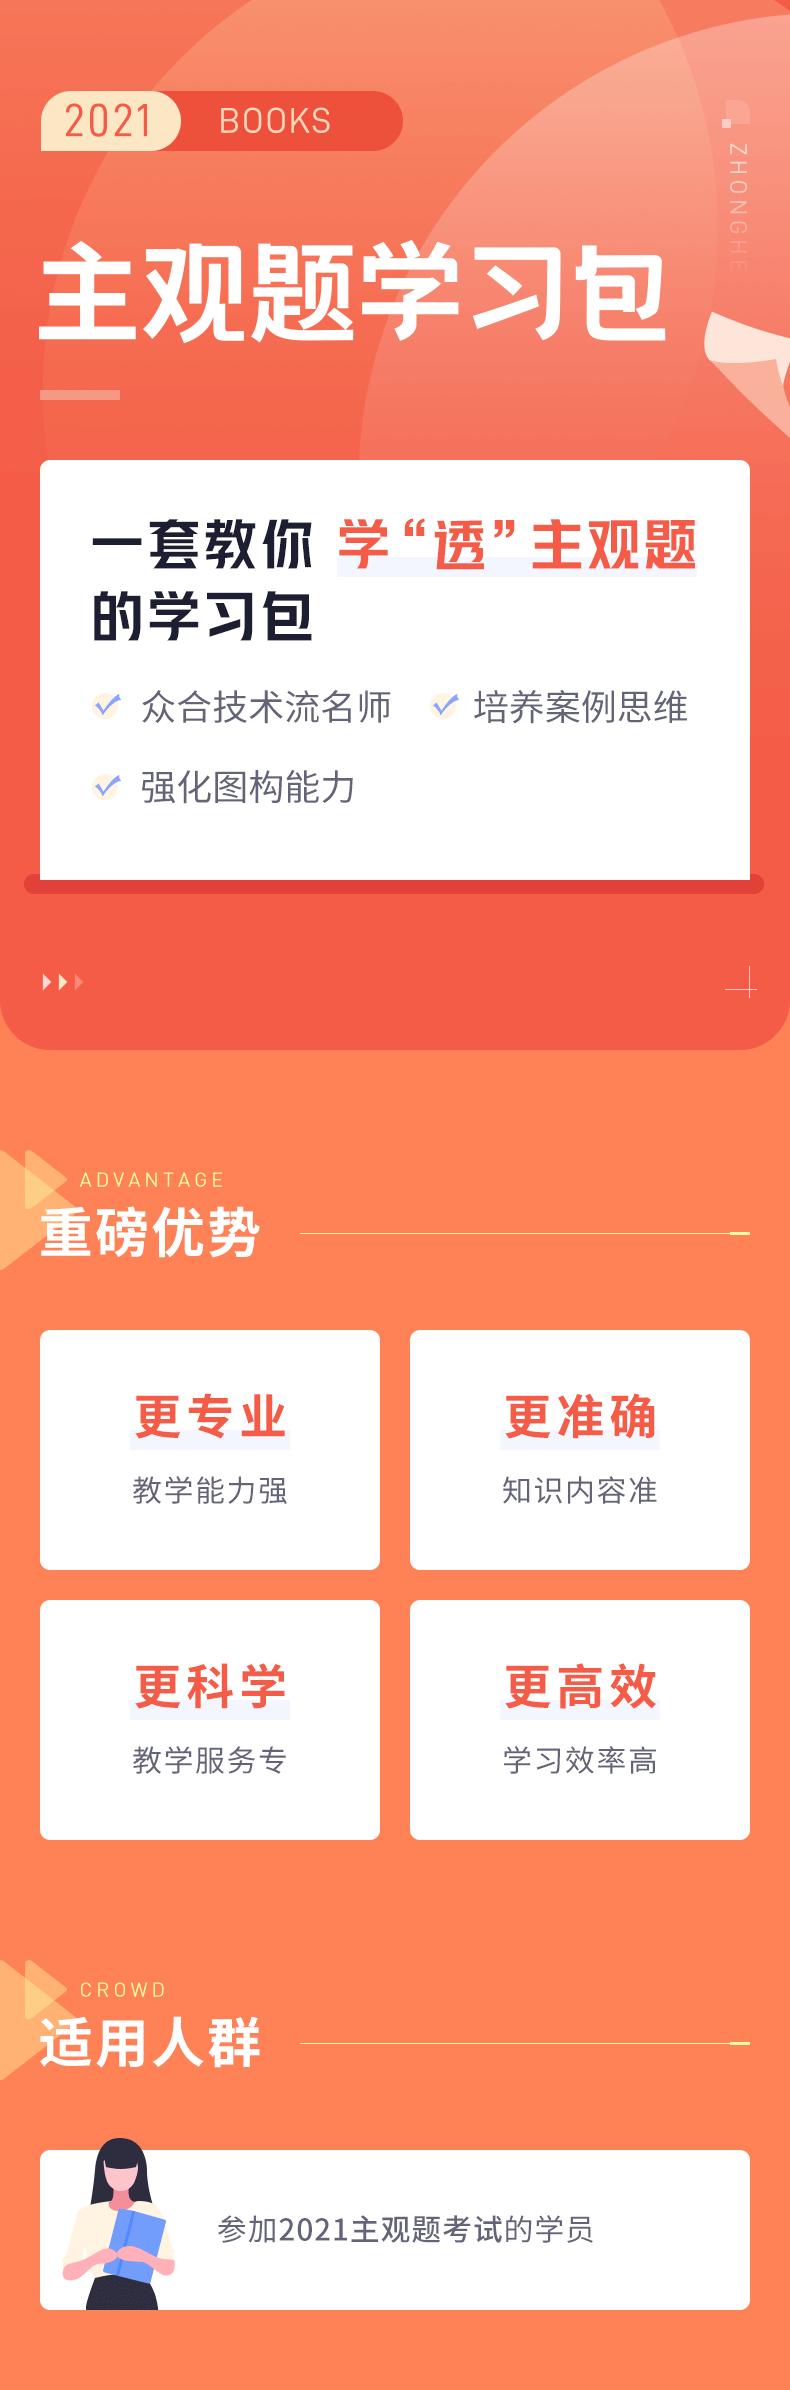 2021主观题学习包_01.png